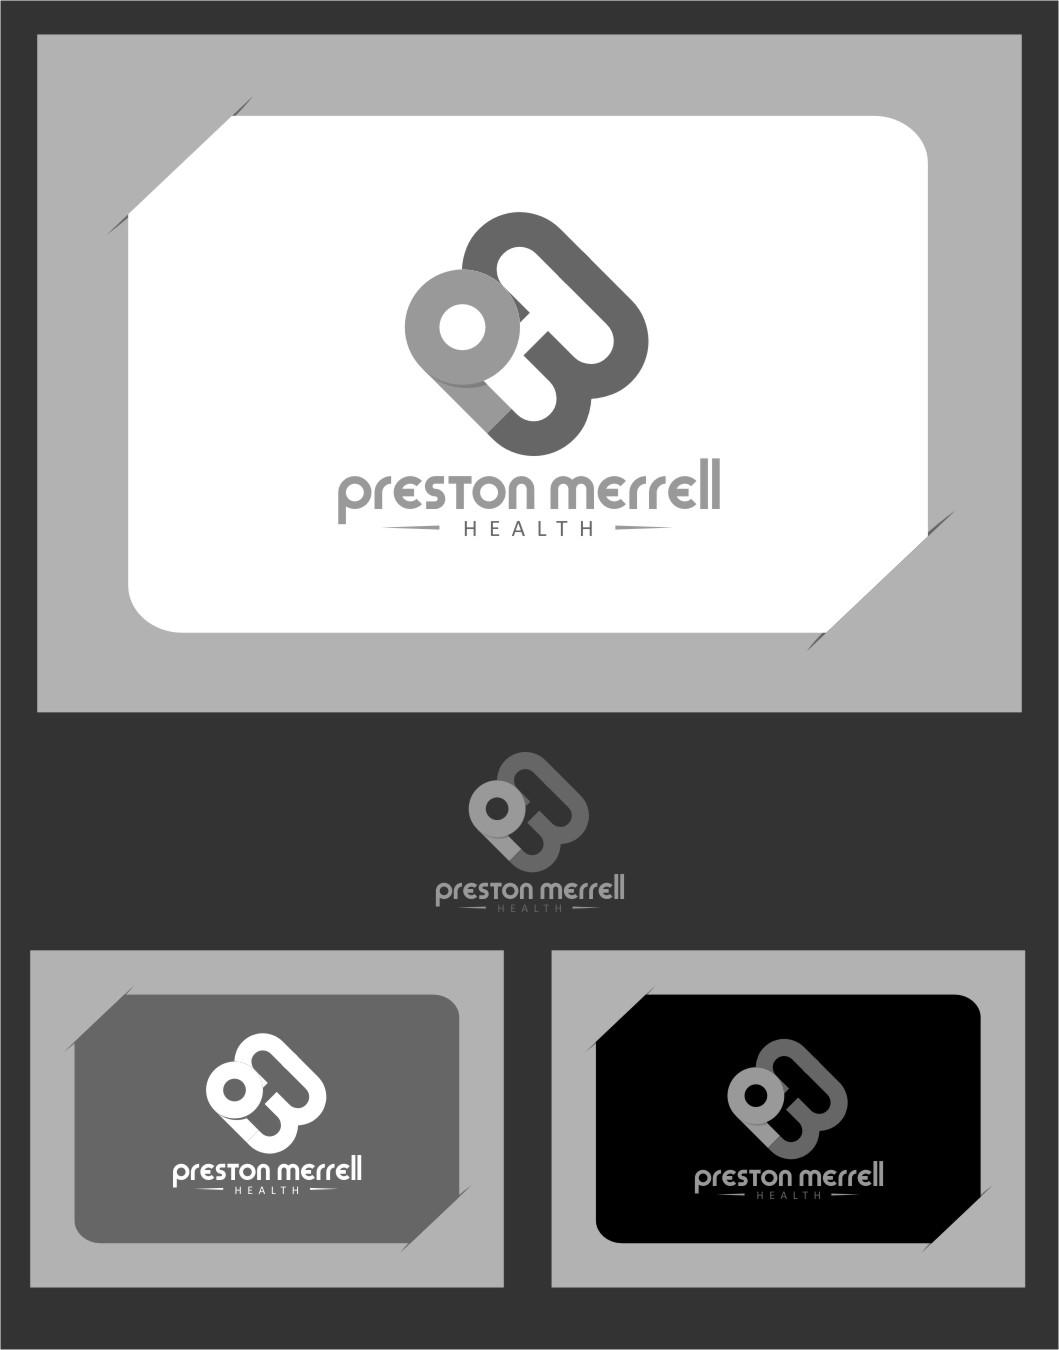 Logo Design by Ngepet_art - Entry No. 190 in the Logo Design Contest Creative Logo Design for Preston Merrell Health.